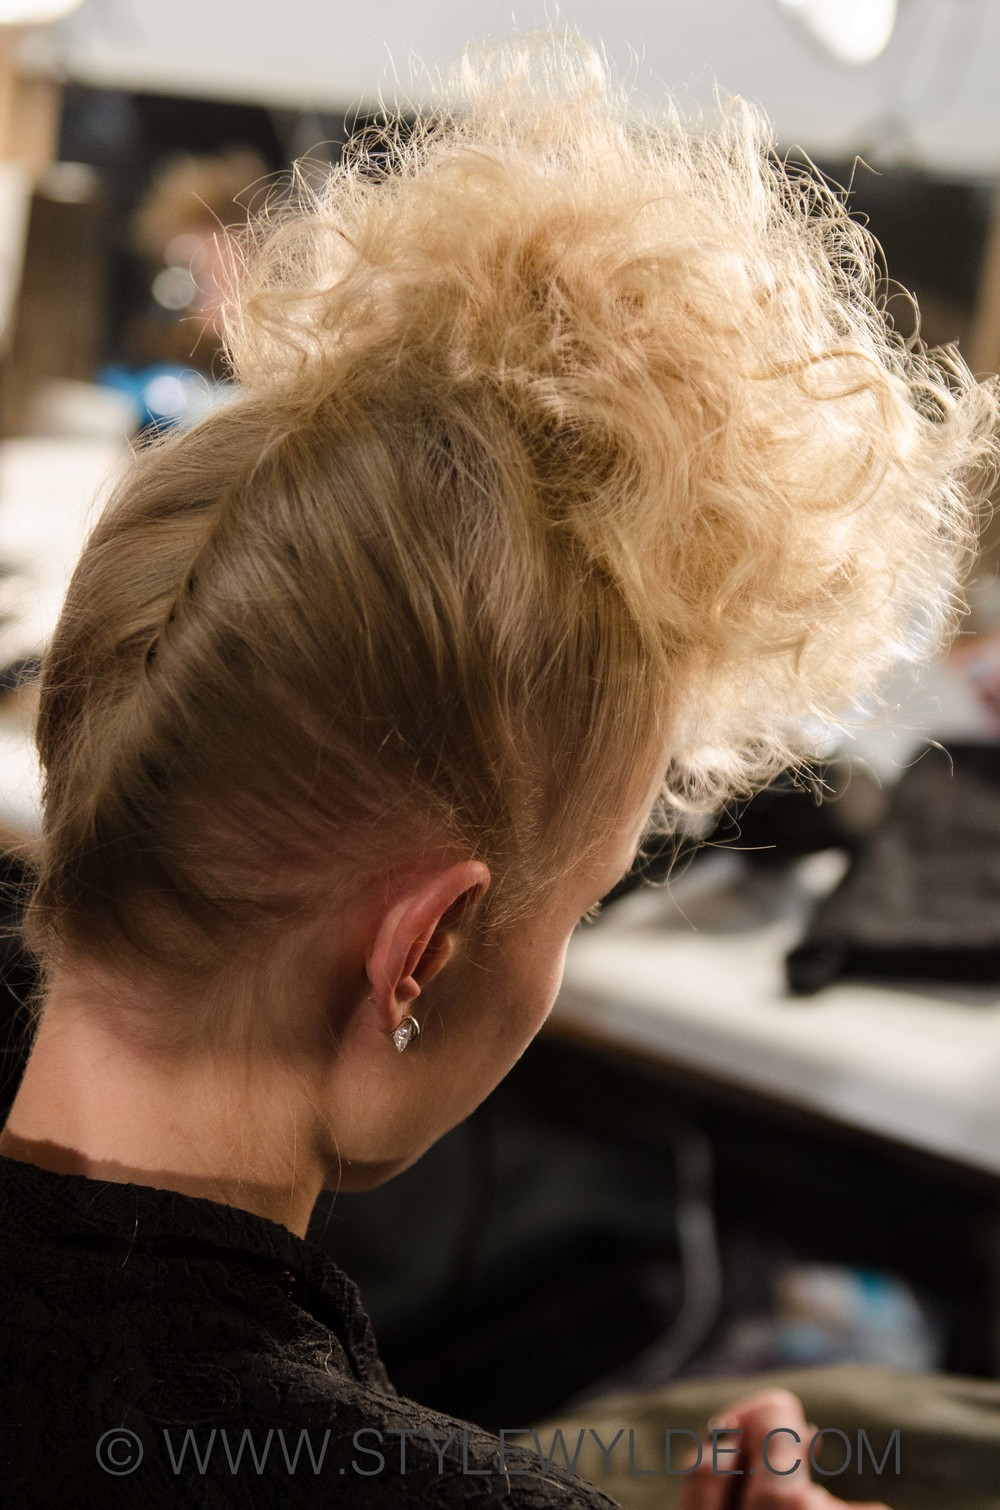 Stylewylde_KatyaLeonovich_Hair_FW2014_CA 1 of 1.jpg